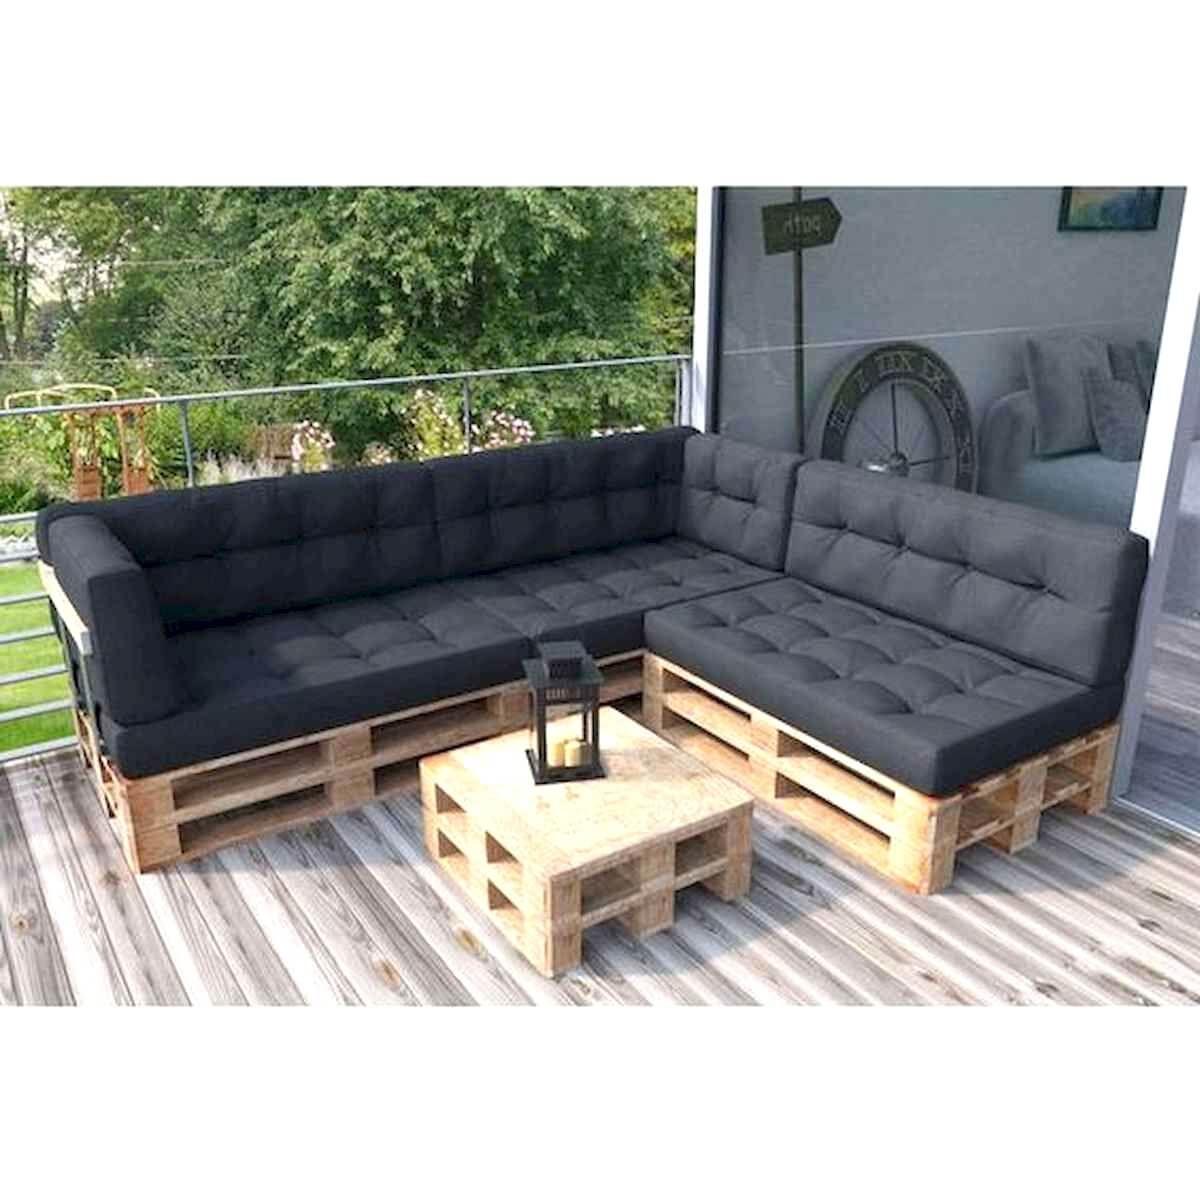 50 Super Cool Diy Projects Pallet Sofa Design Ideas Pallet Furniture Plans Diy Furniture Couch Pallet Sofa